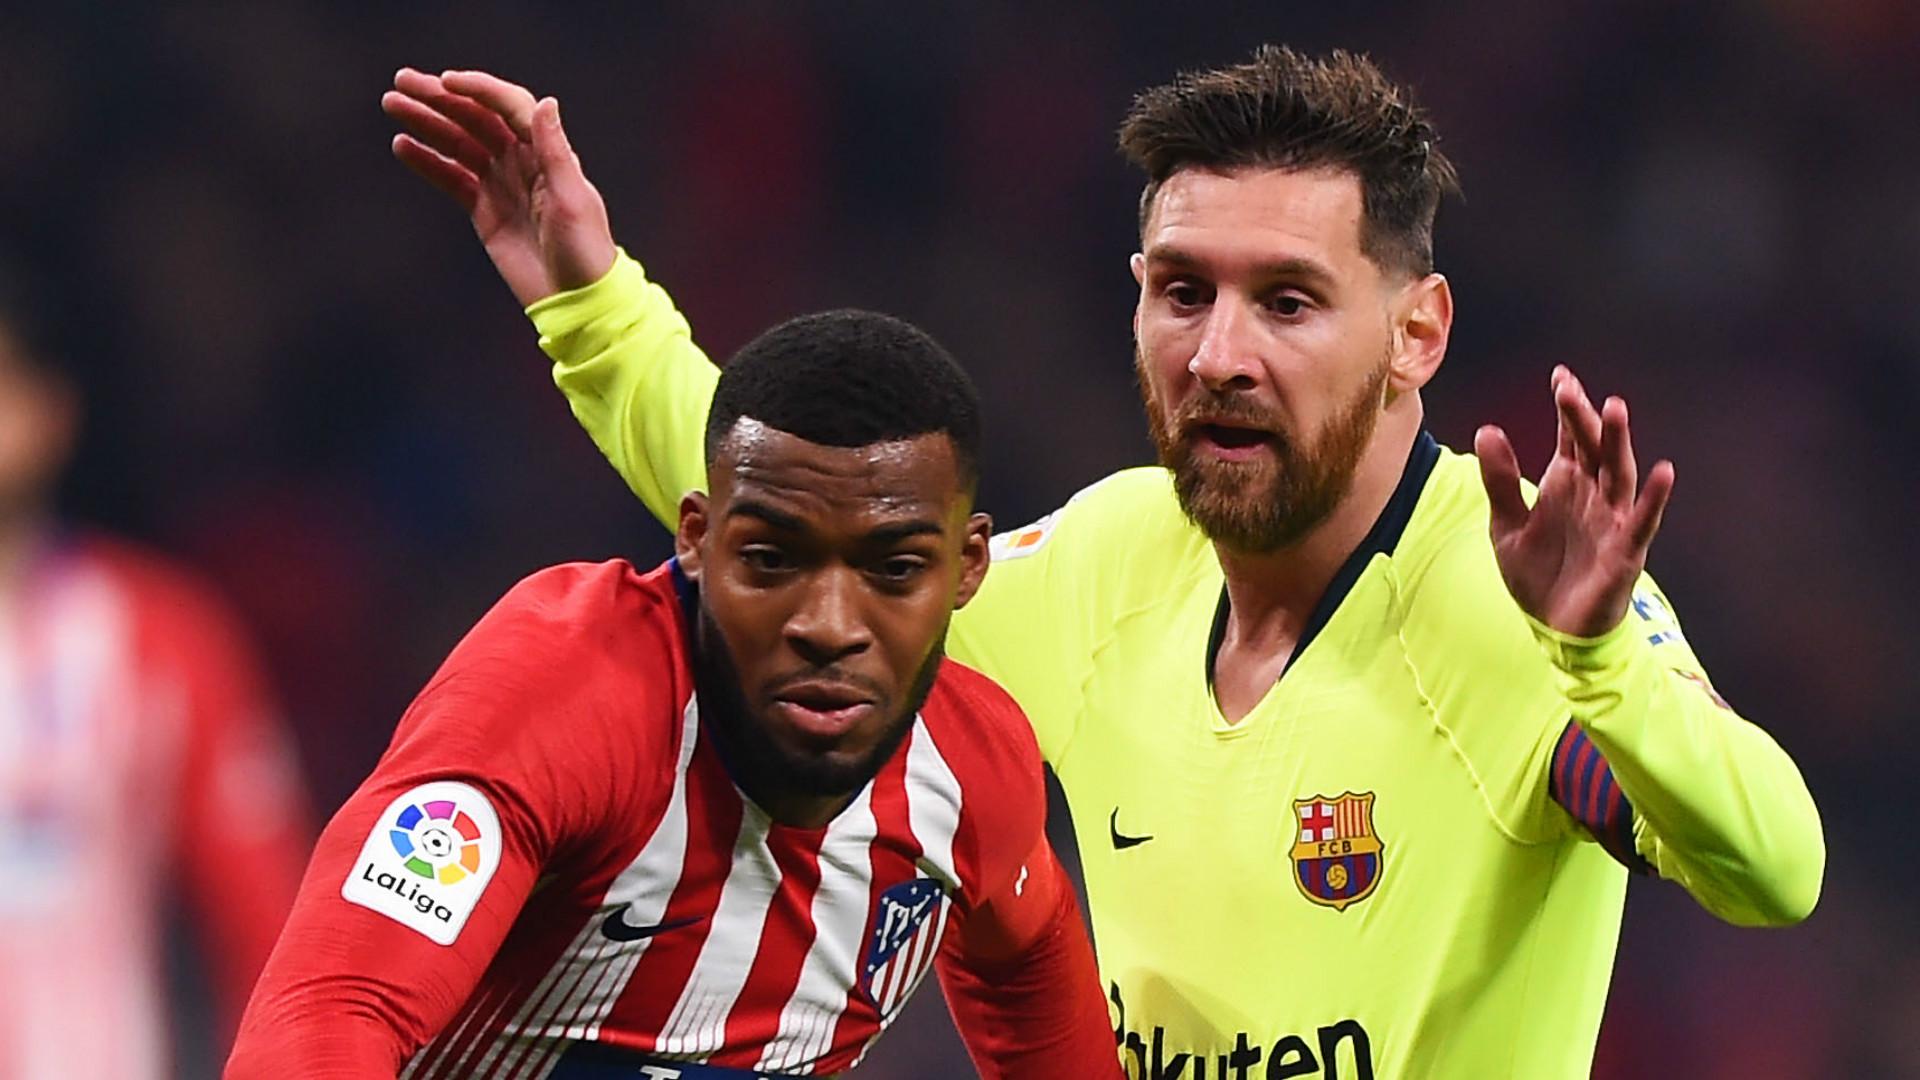 Thomas Lemar Lionel Messi Atletico Madrid Barcelona 2018-19